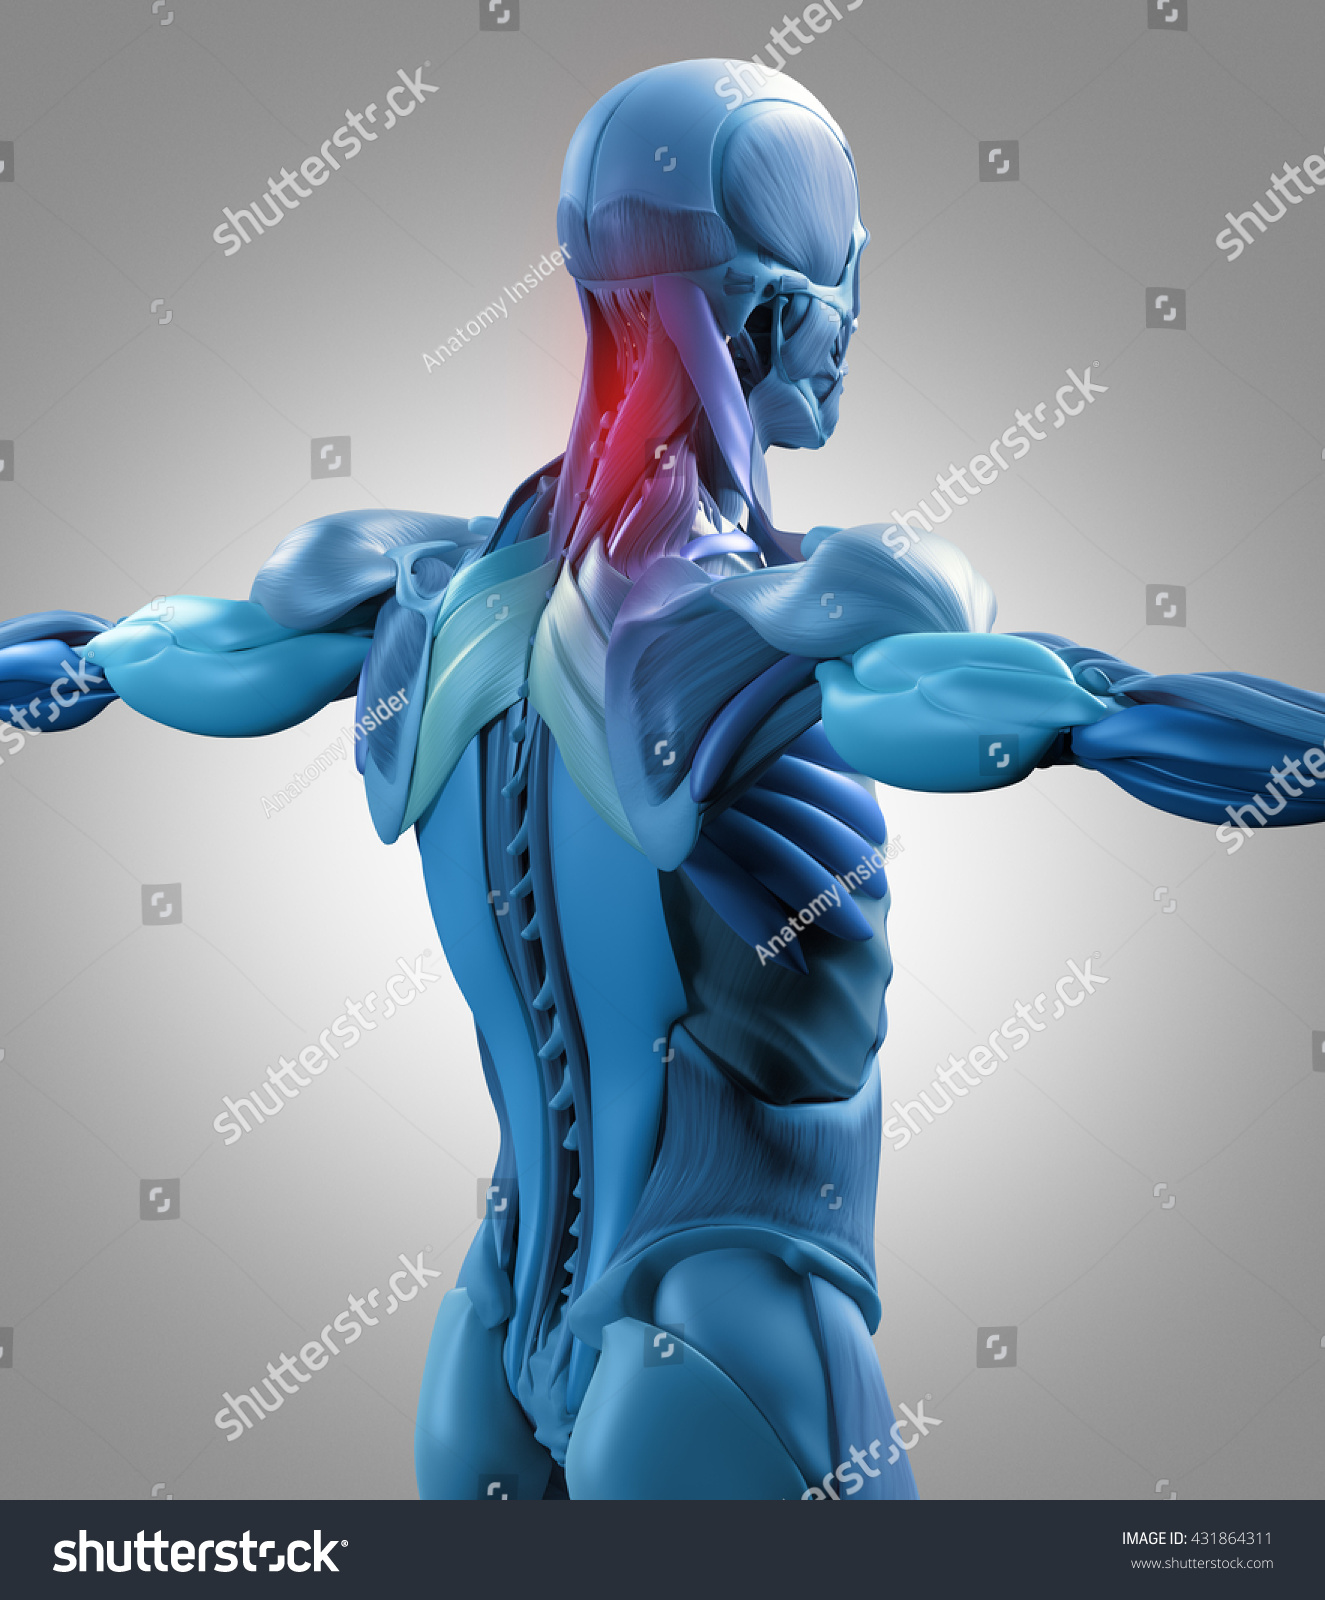 Human Anatomy Muscle Groups Torso Back Stock Illustration 431864311 ...